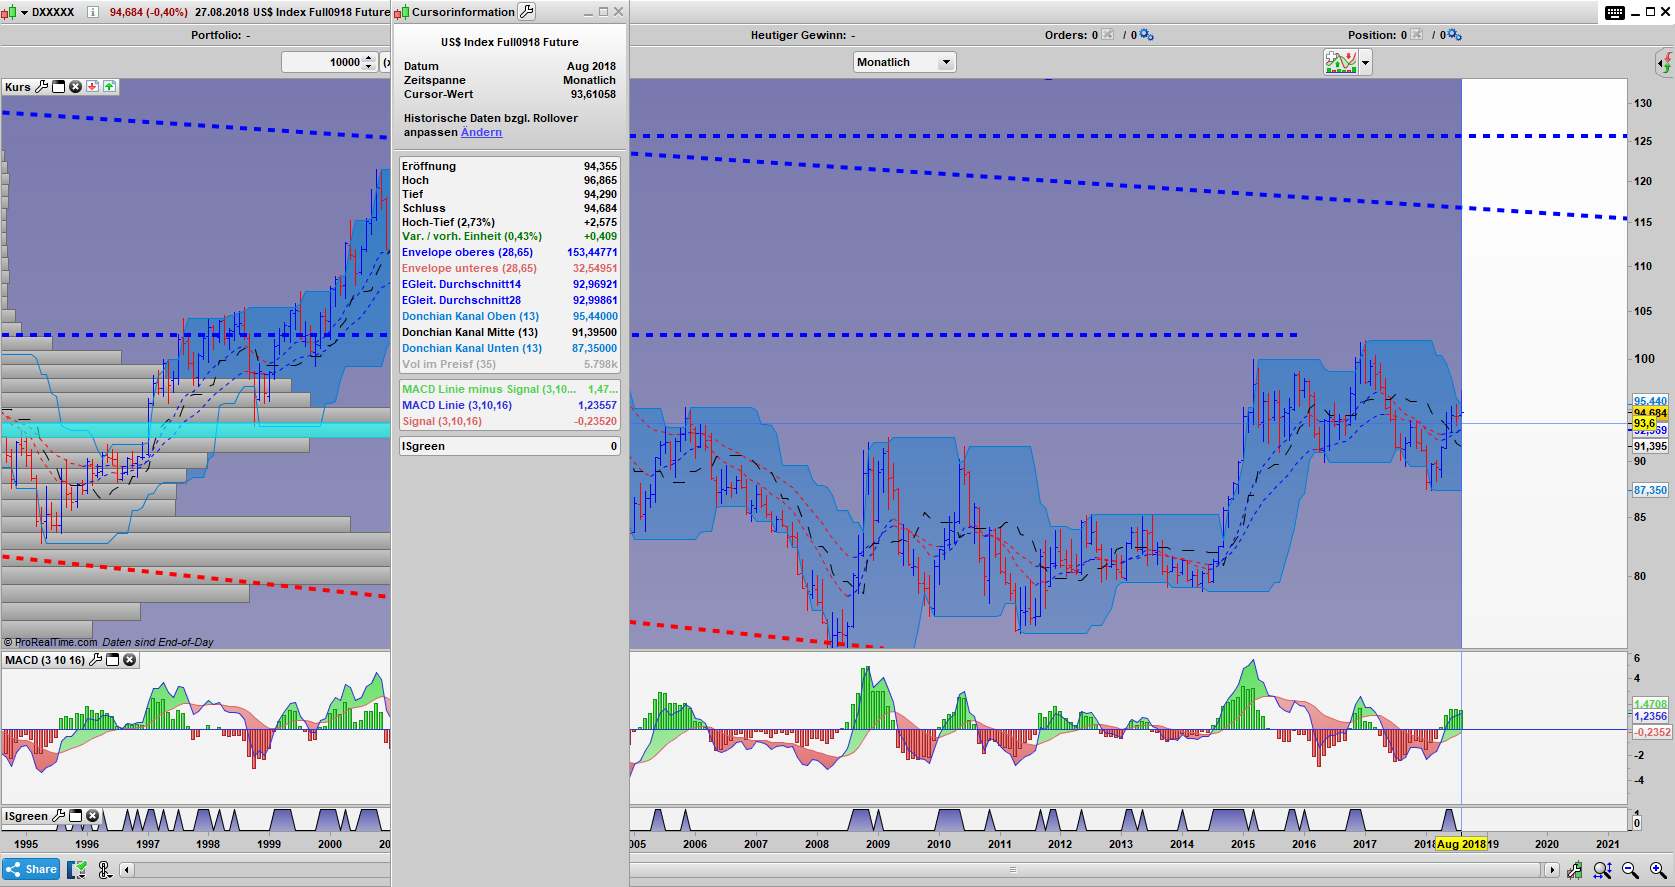 DX Monats Chart: Umkehrstab möglich!